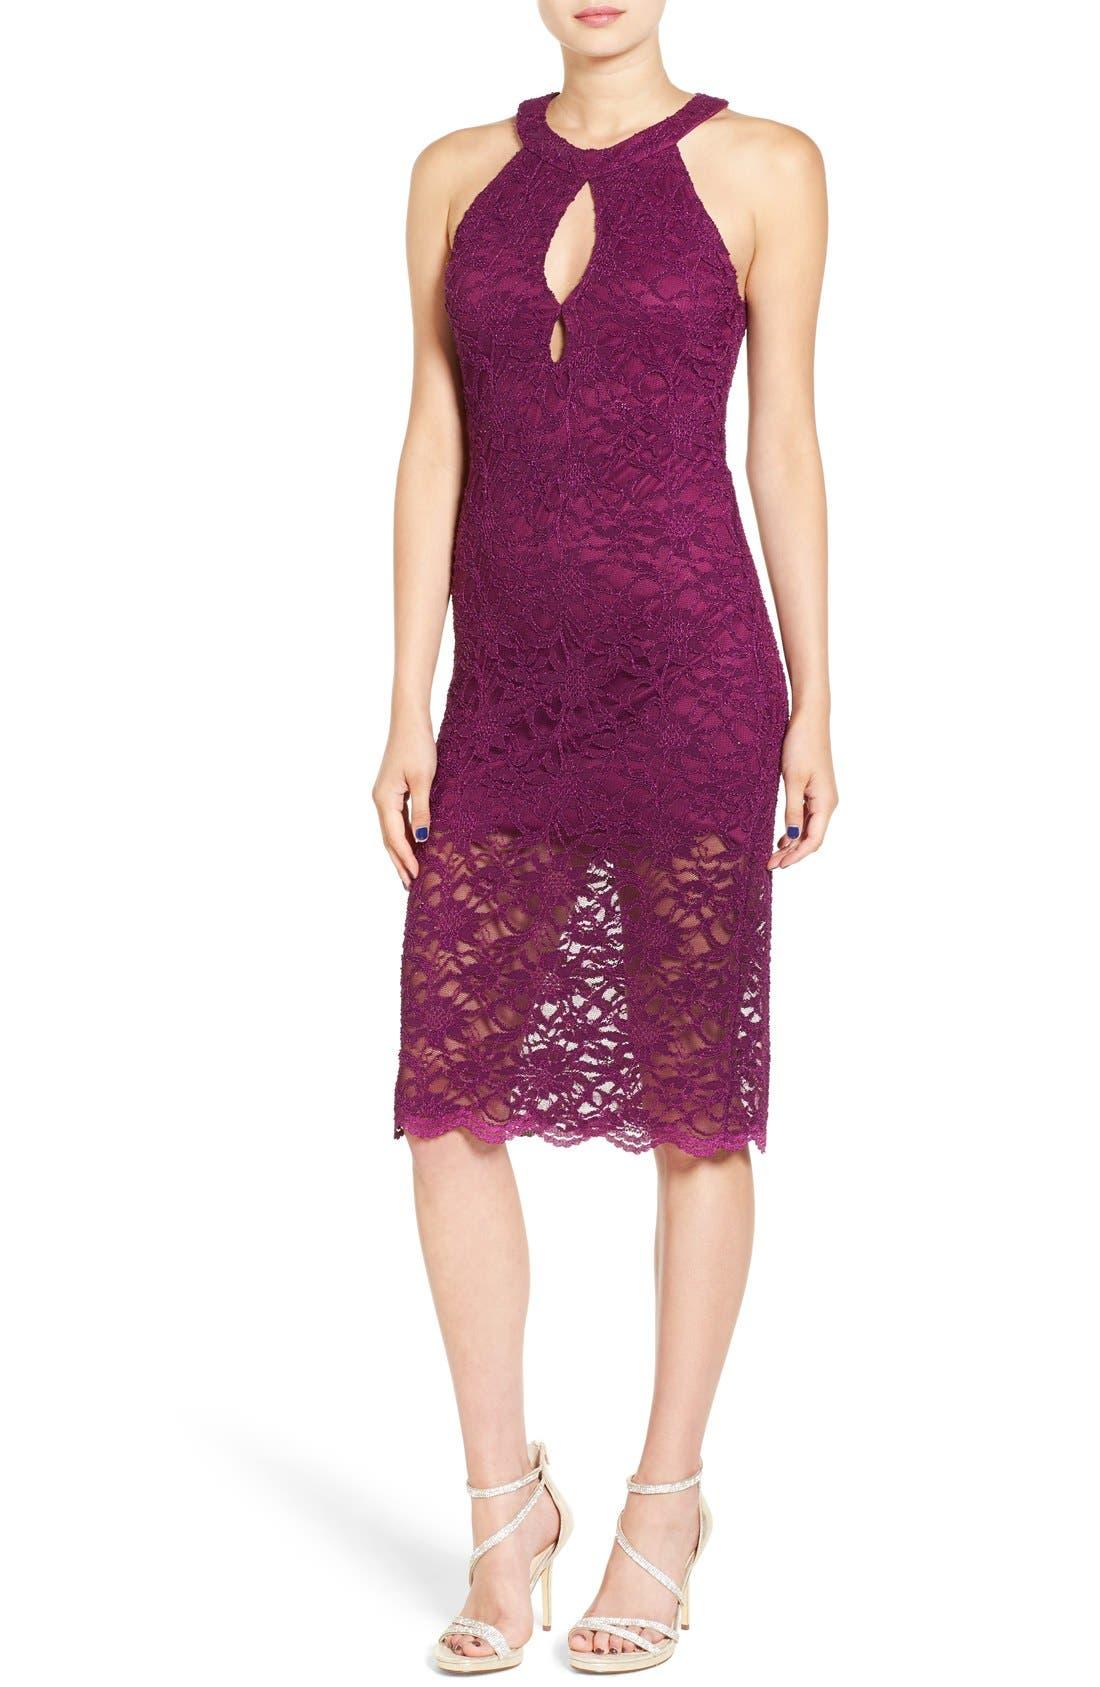 Alternate Image 1 Selected - Jump Apparel Lace Midi Body-Con Dress